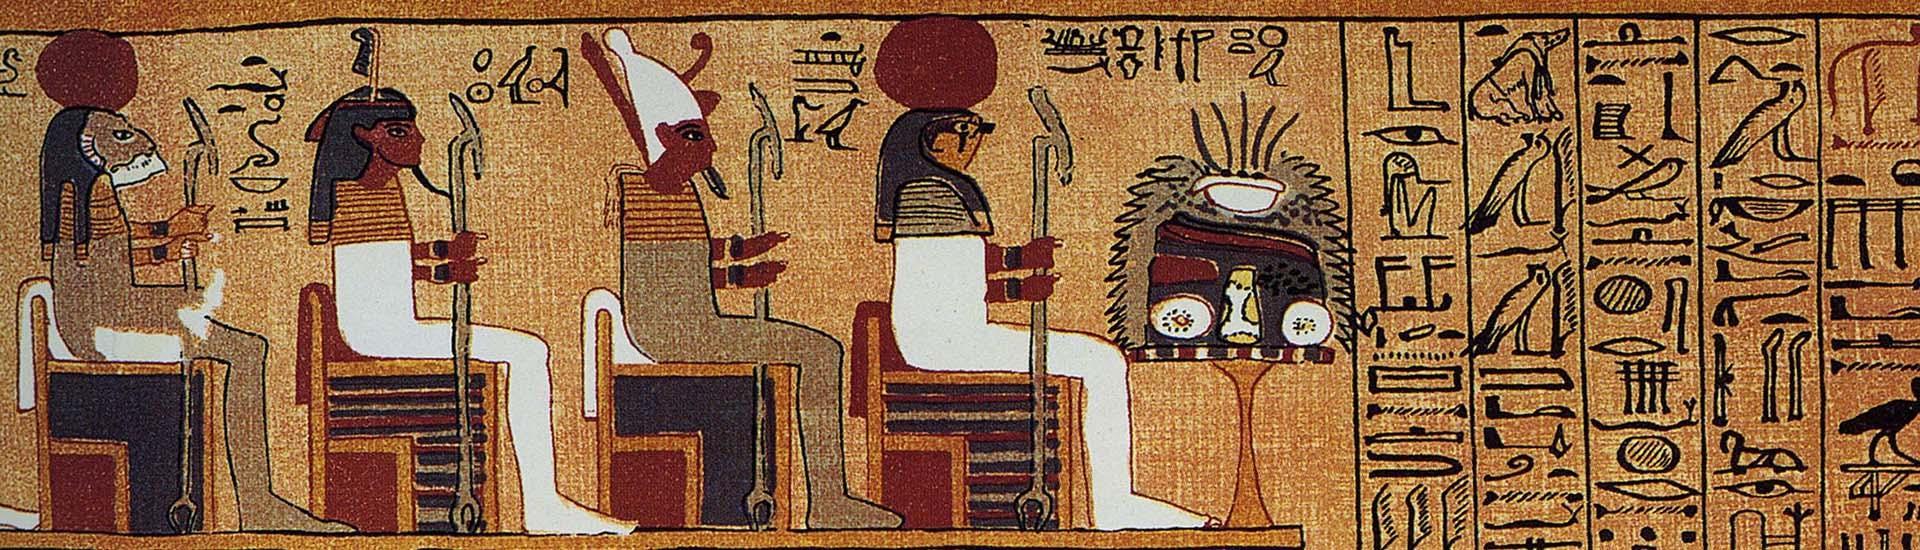 An Ancient Egyptian scroll